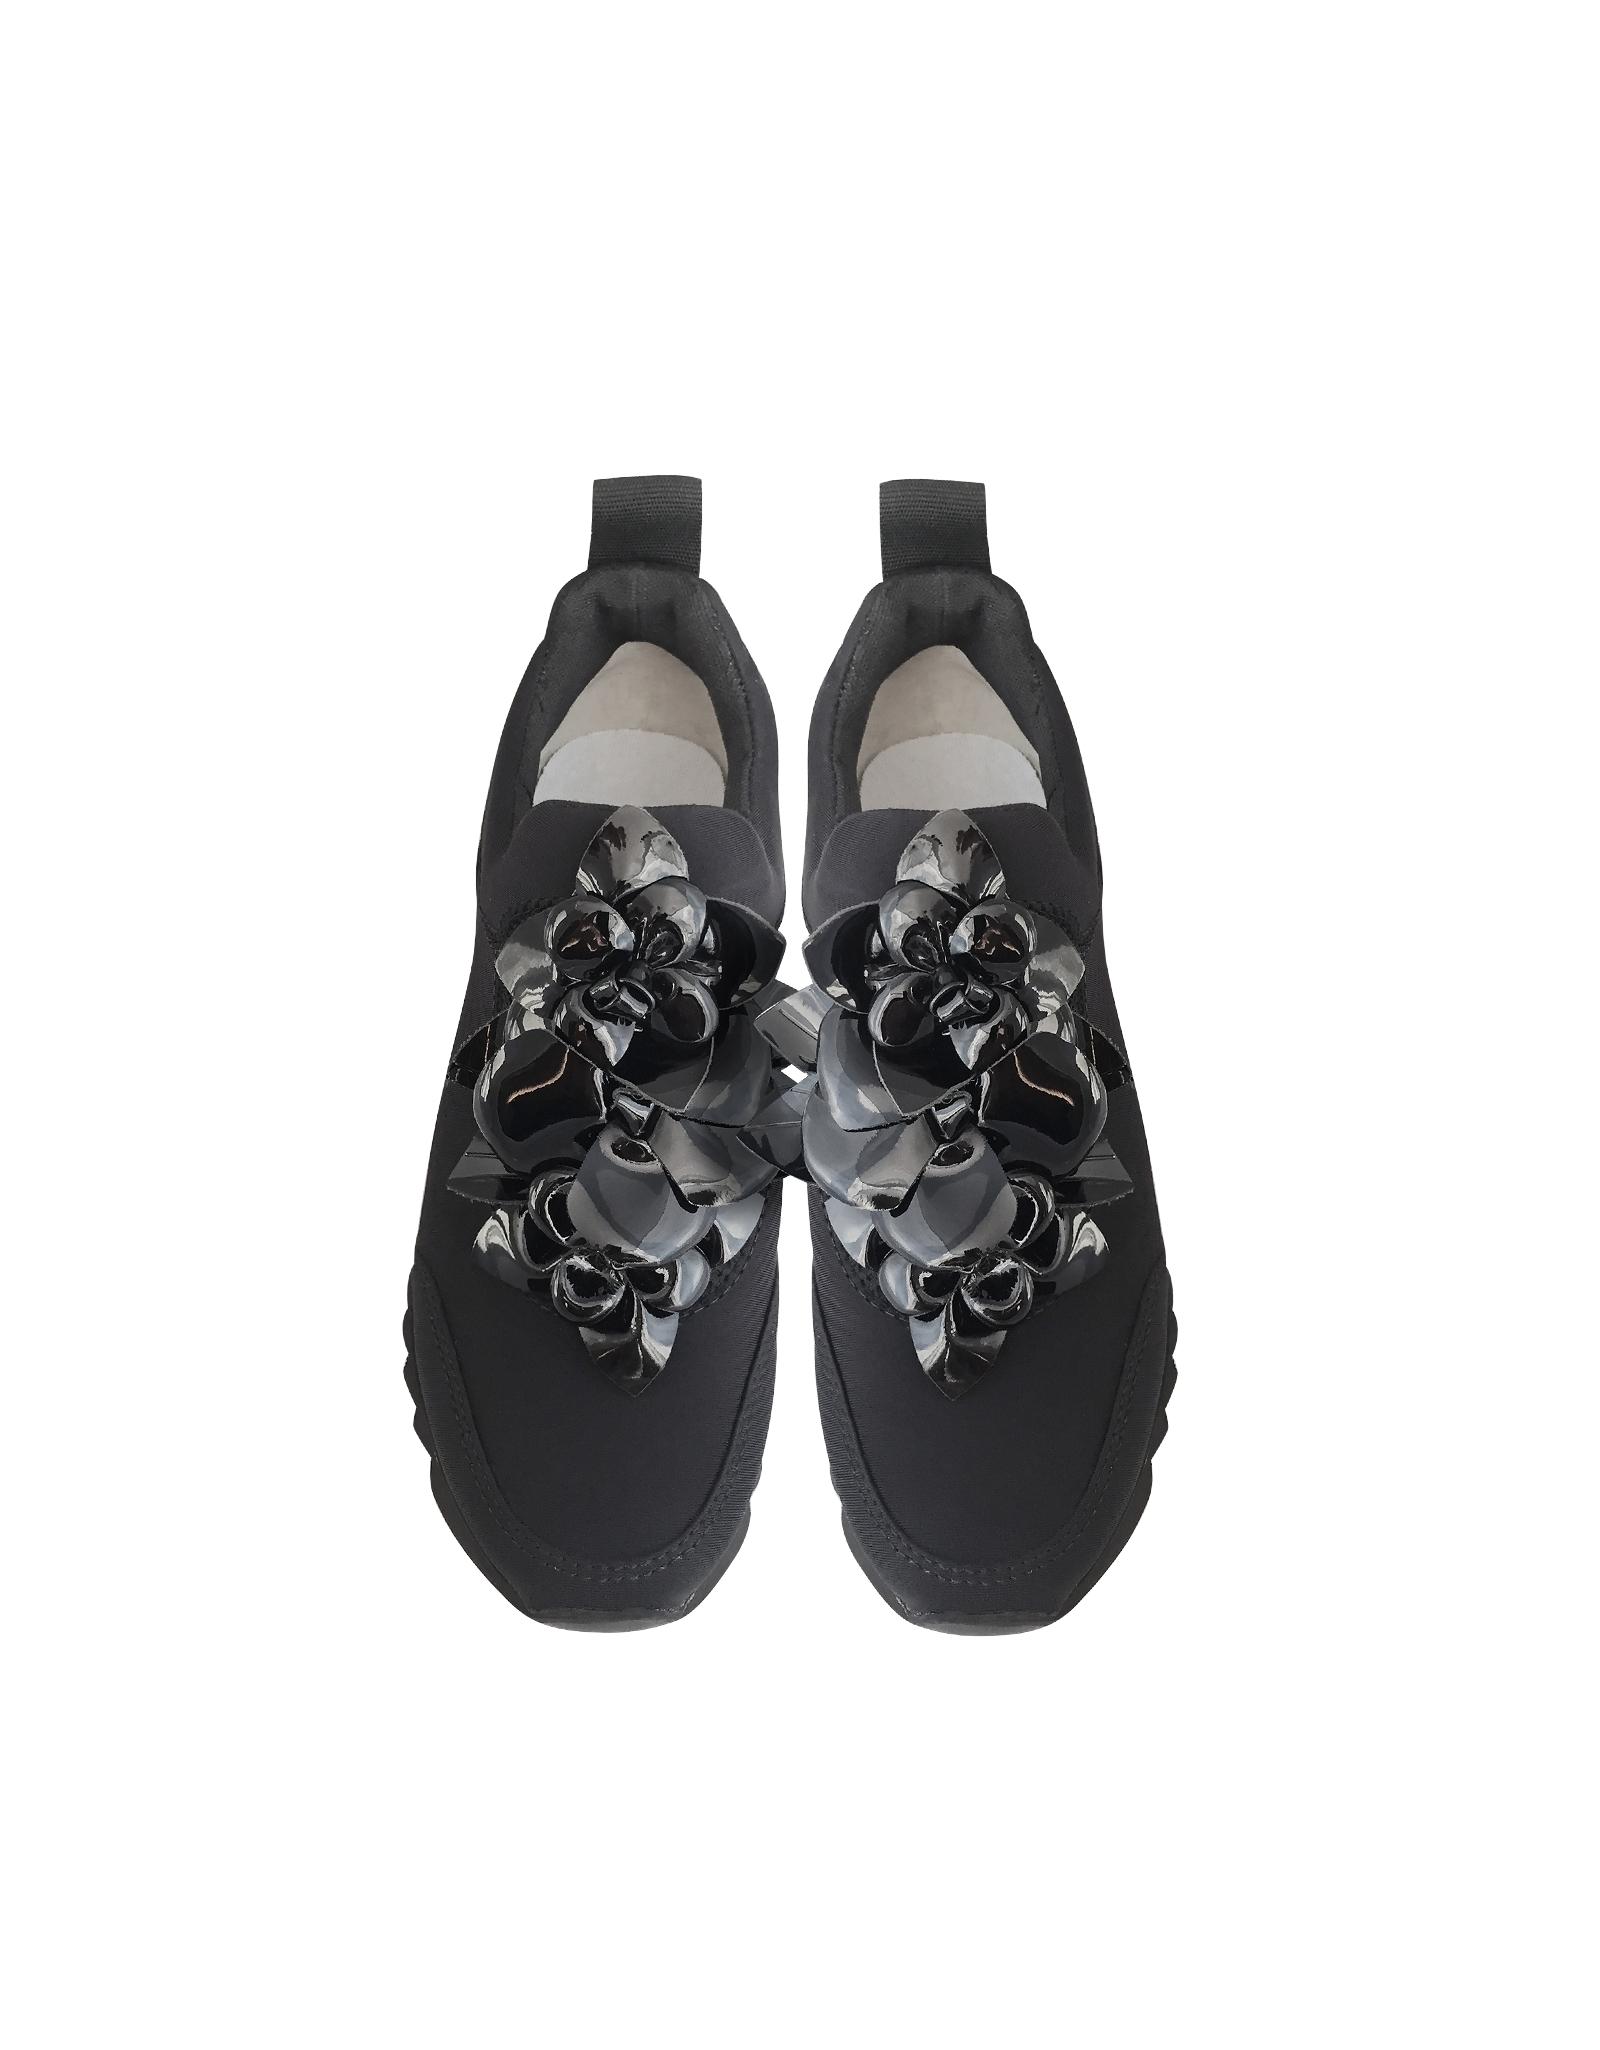 db1a6e7741cbf Lyst - Tory Burch Blossom Black Neoprene Sneaker in Black